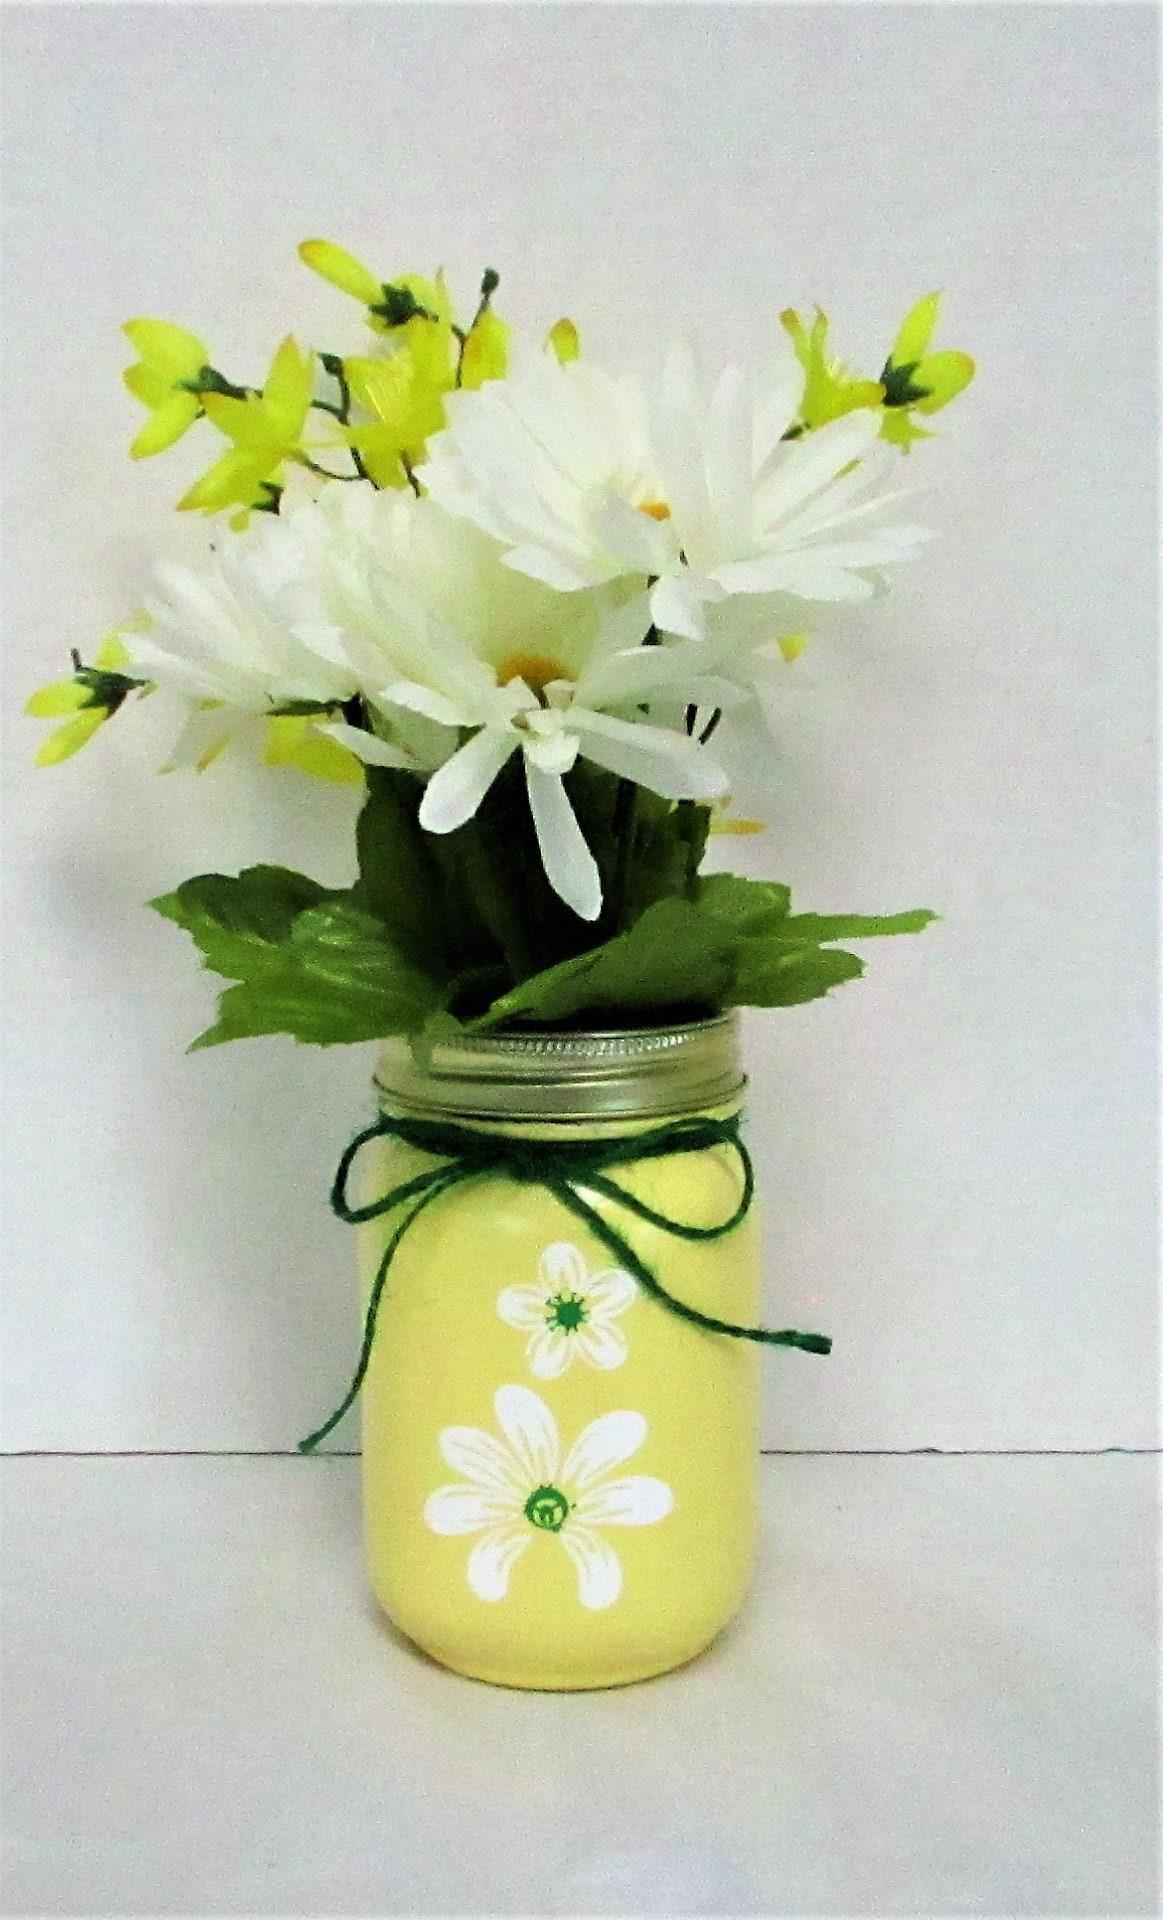 Yellow spring vase mason jar vase spring decor bathroom yellow spring vase mason jar vase spring decor bathroom decor home decor housewarming gift mason jar decor mothers day gift reviewsmspy